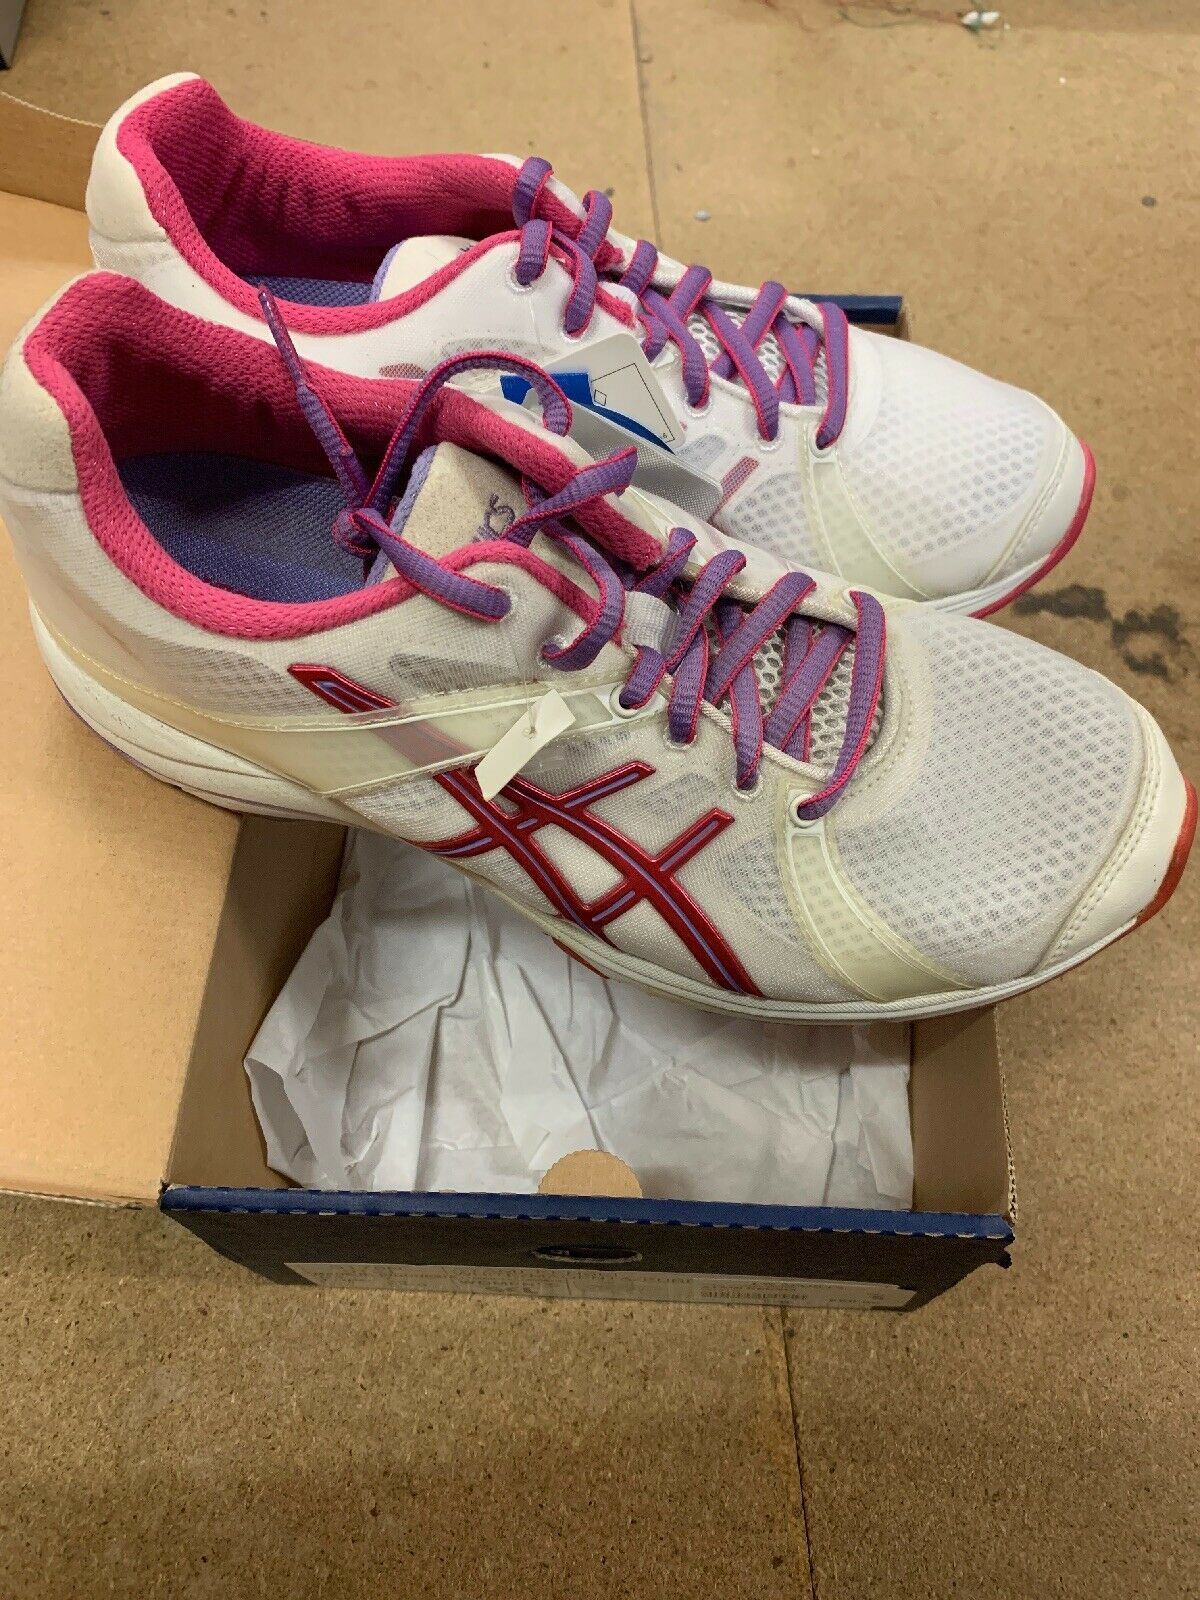 Asics Ayami Kensei Women's Running shoes